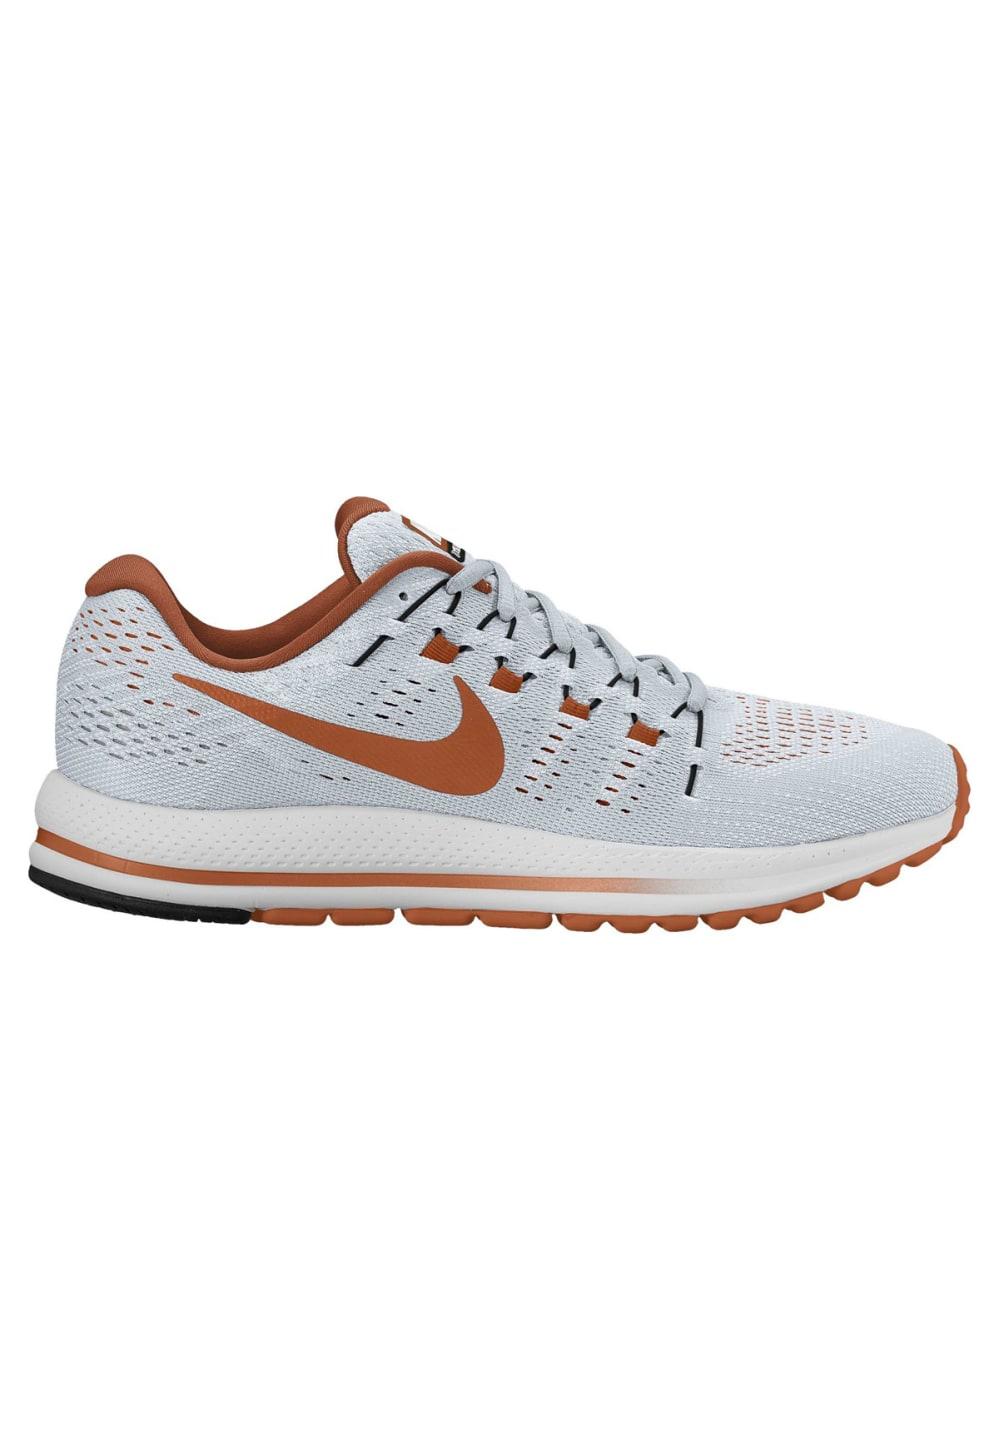 Nike Air Zoom Vomero 12 TB - Laufschuhe für Damen - Grau